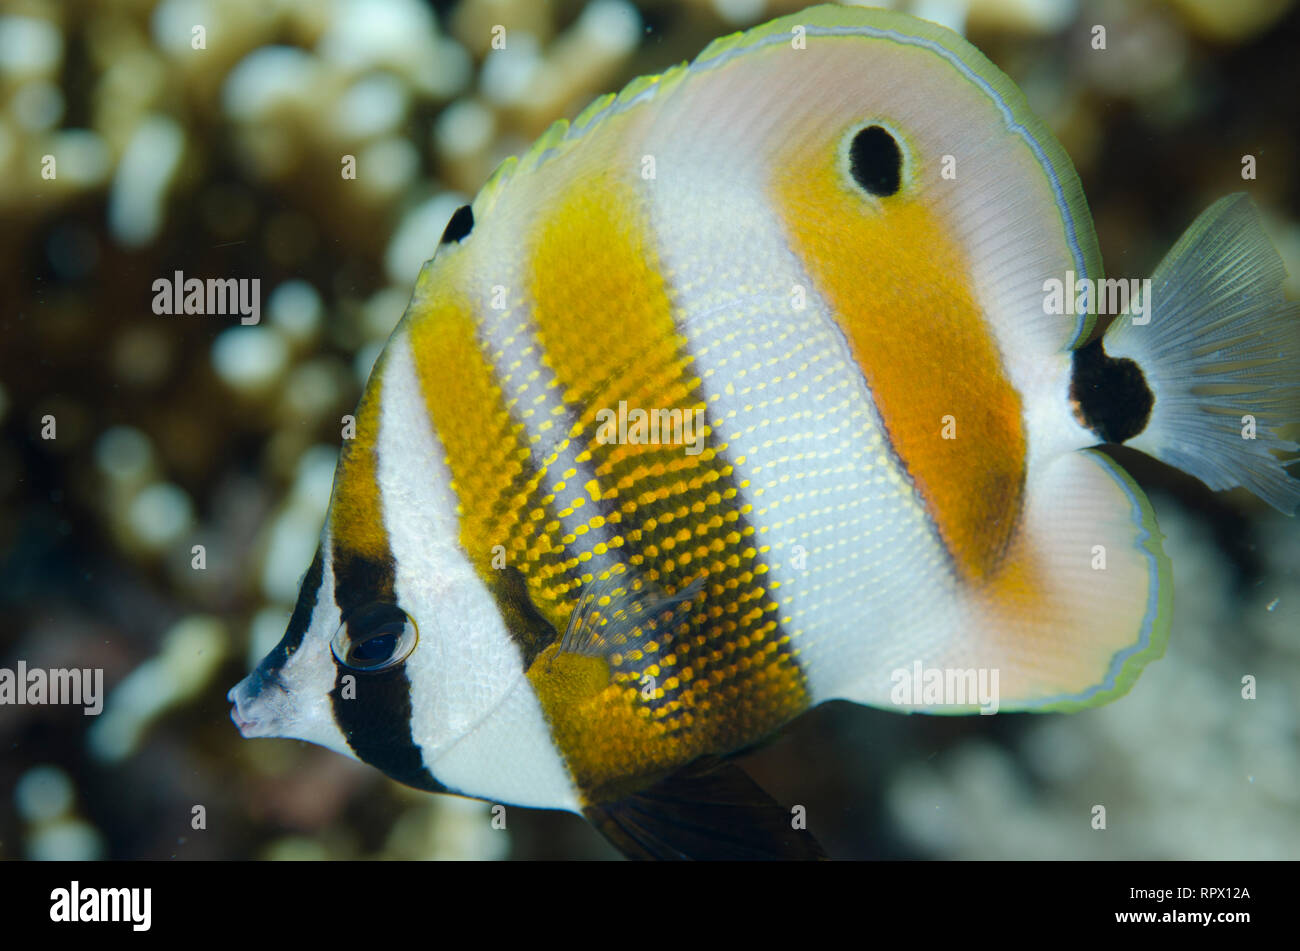 Orange-banded Coralfish, Coradion chrysozonus, Barracuda Rock dive site, Fiabacet Island, Misool, Raja Ampat (4 Kings), West Papua, Indonesia - Stock Image